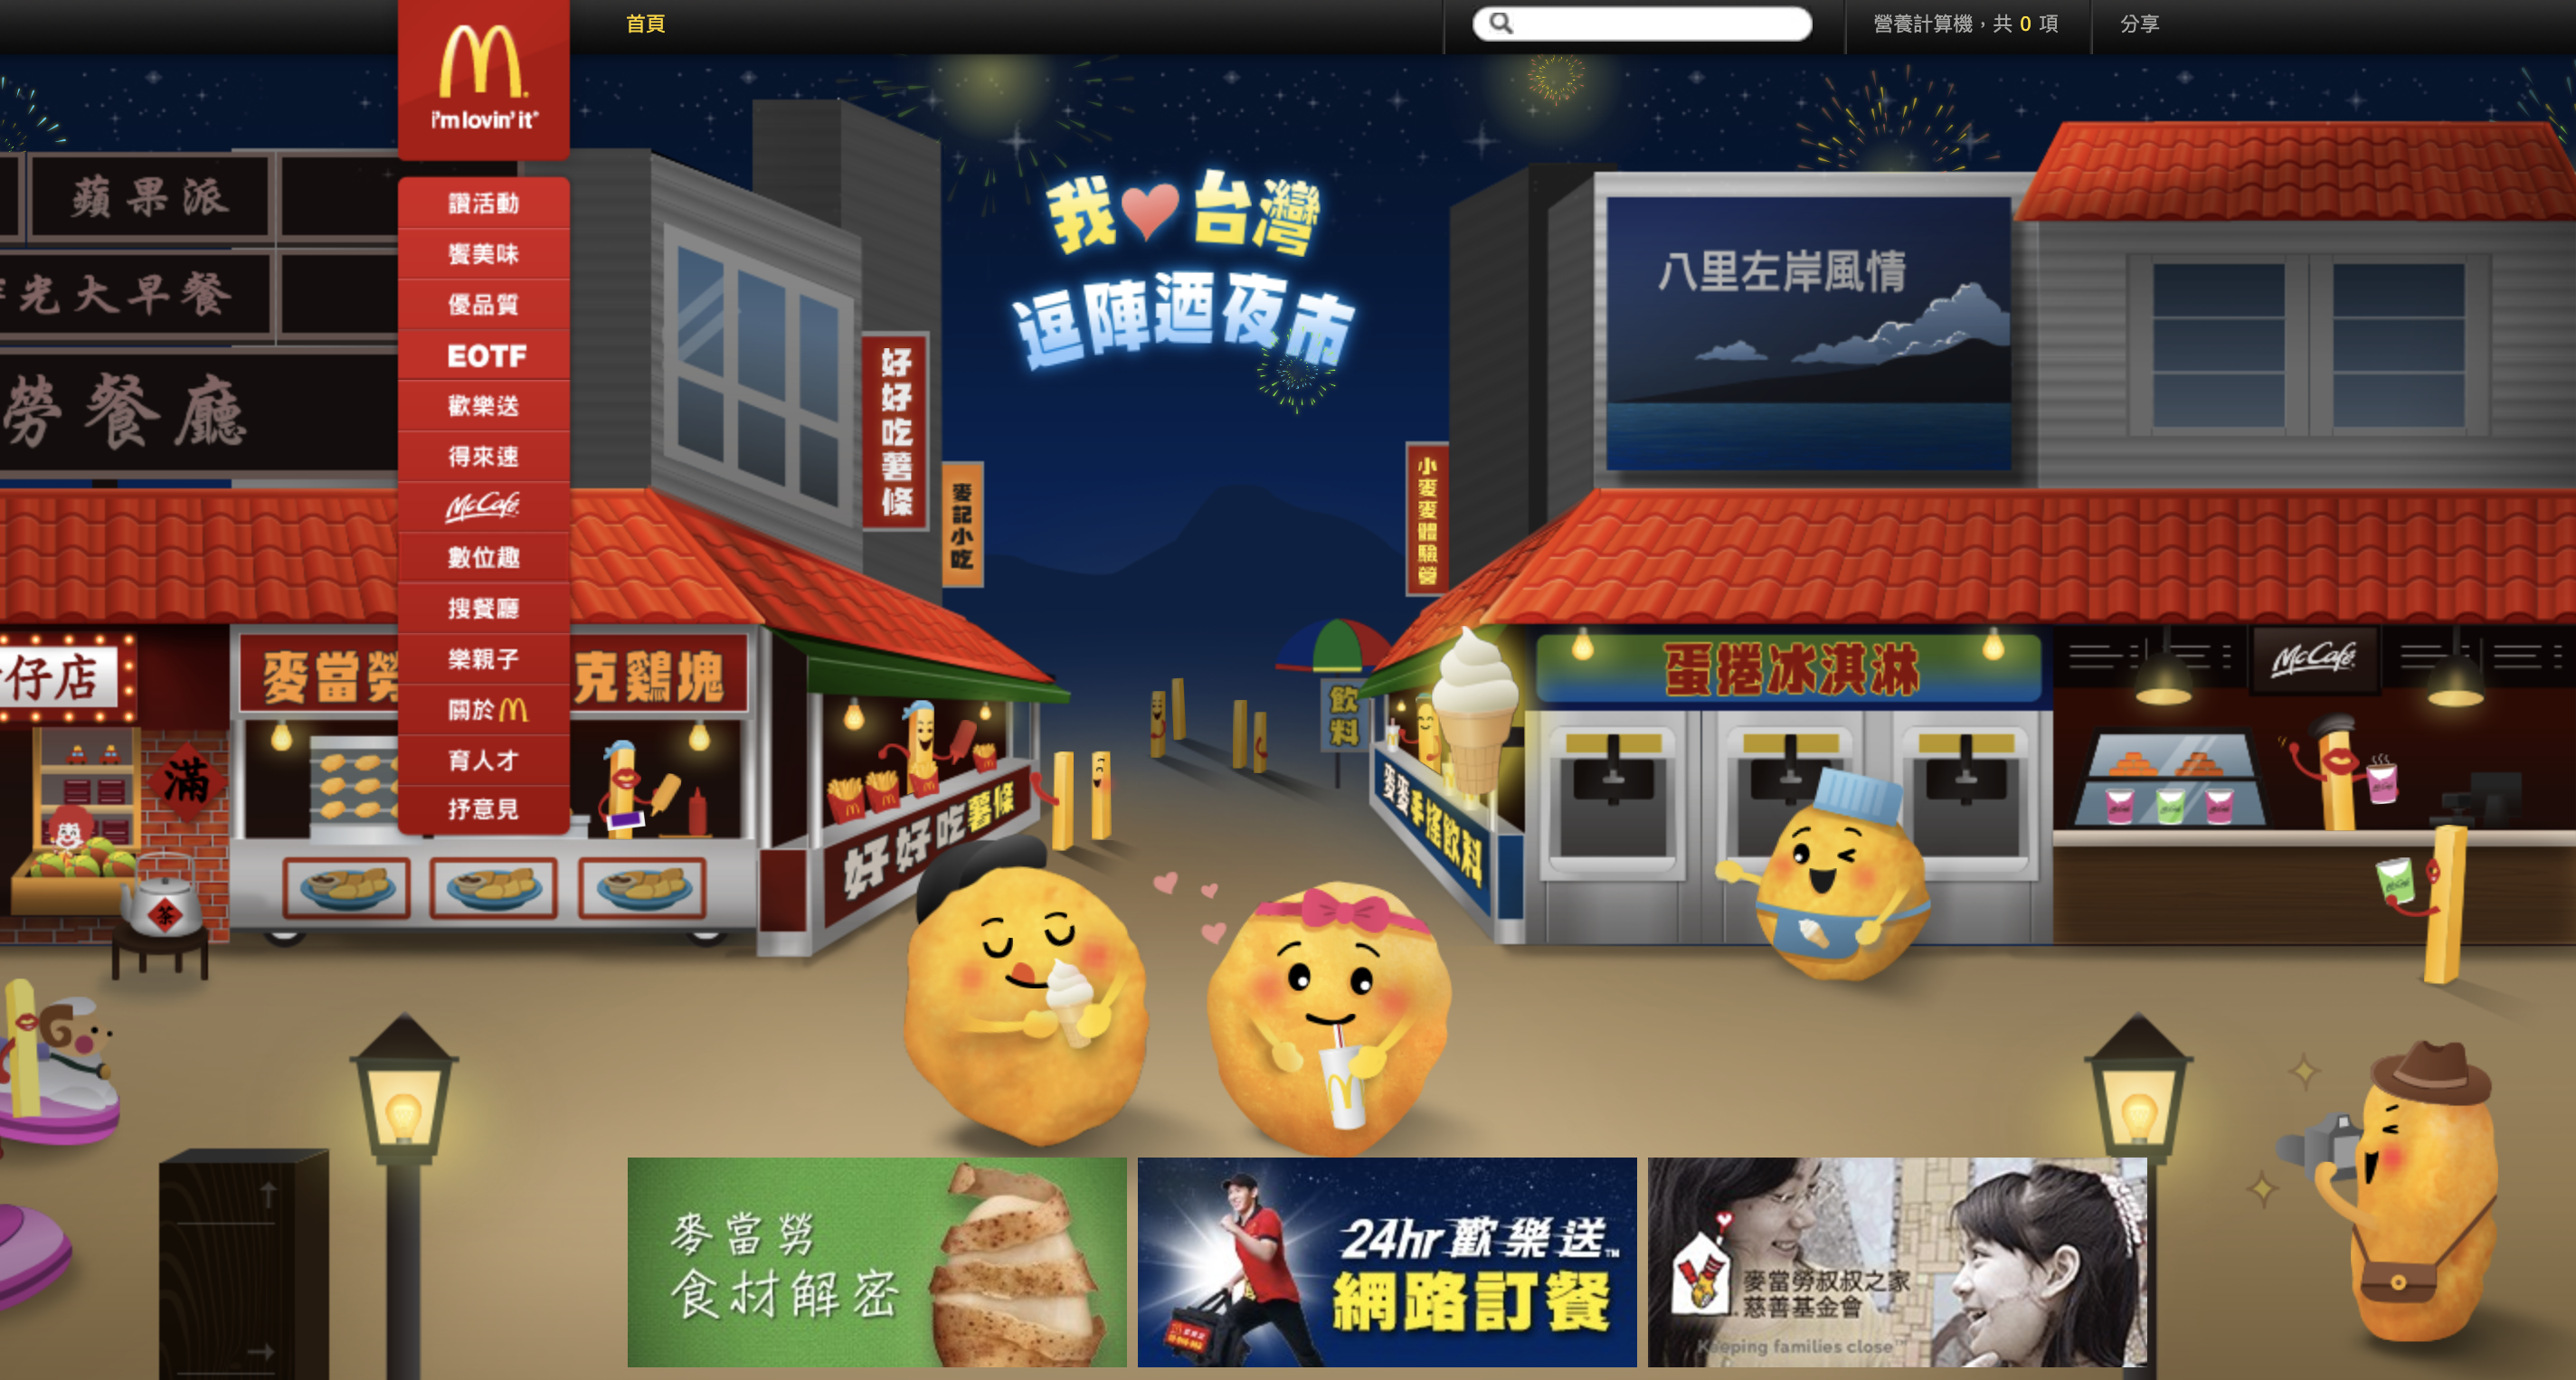 McDonald Taiwan